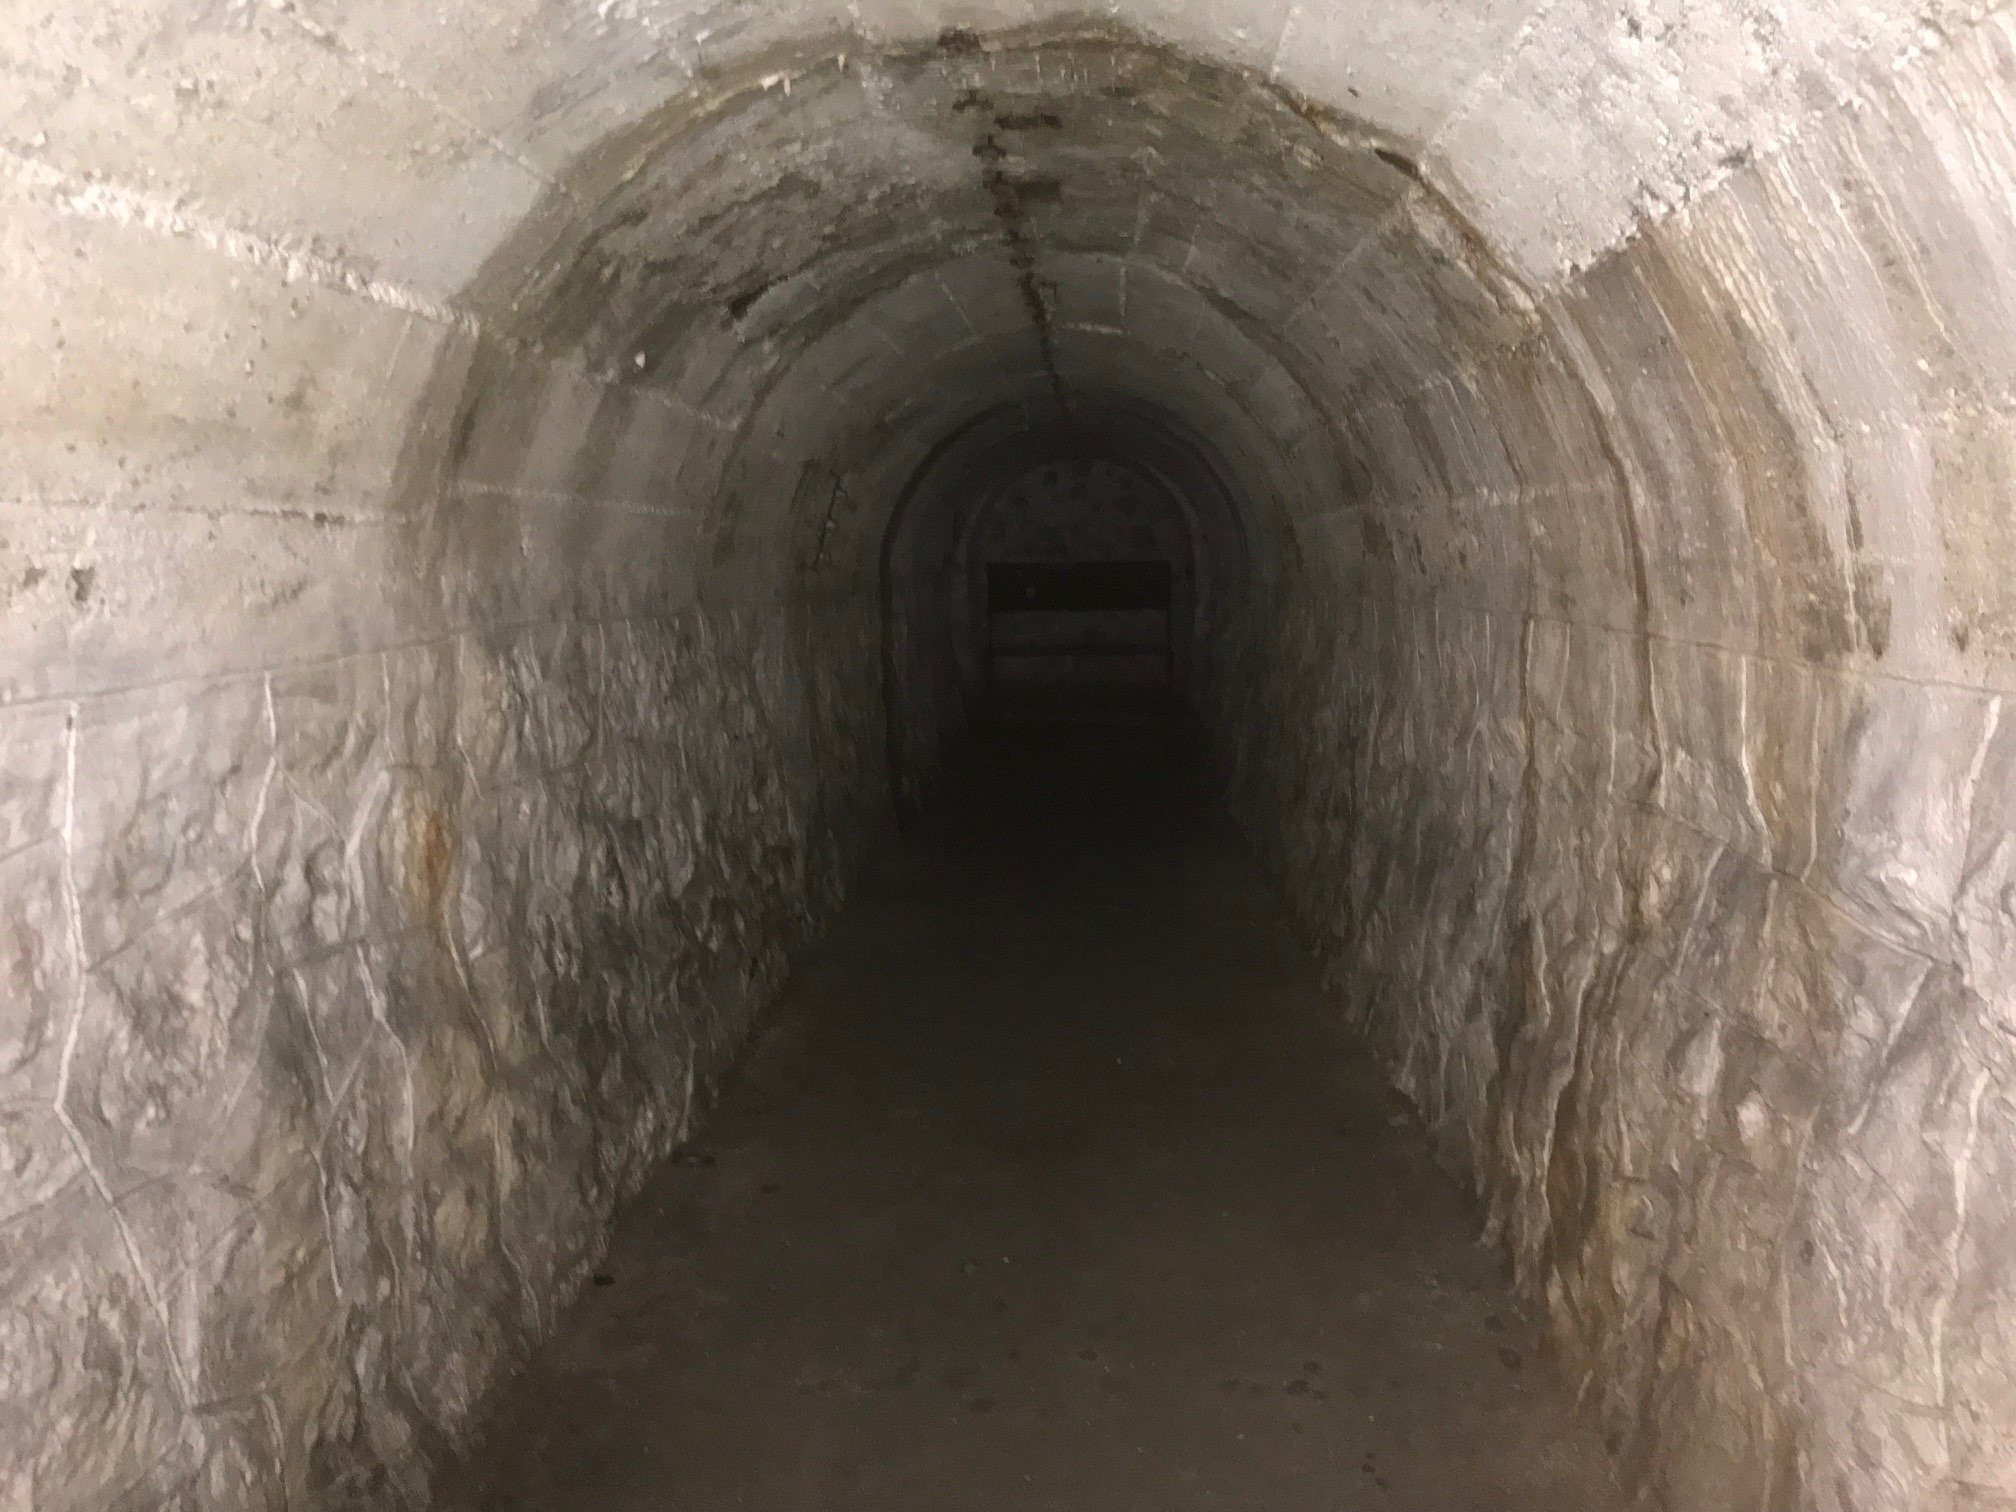 A bunker is seen at the Haydarpaşa excavation area in Kadıköy, Istanbul, on Oct. 12, 2021. (DHA Photo)